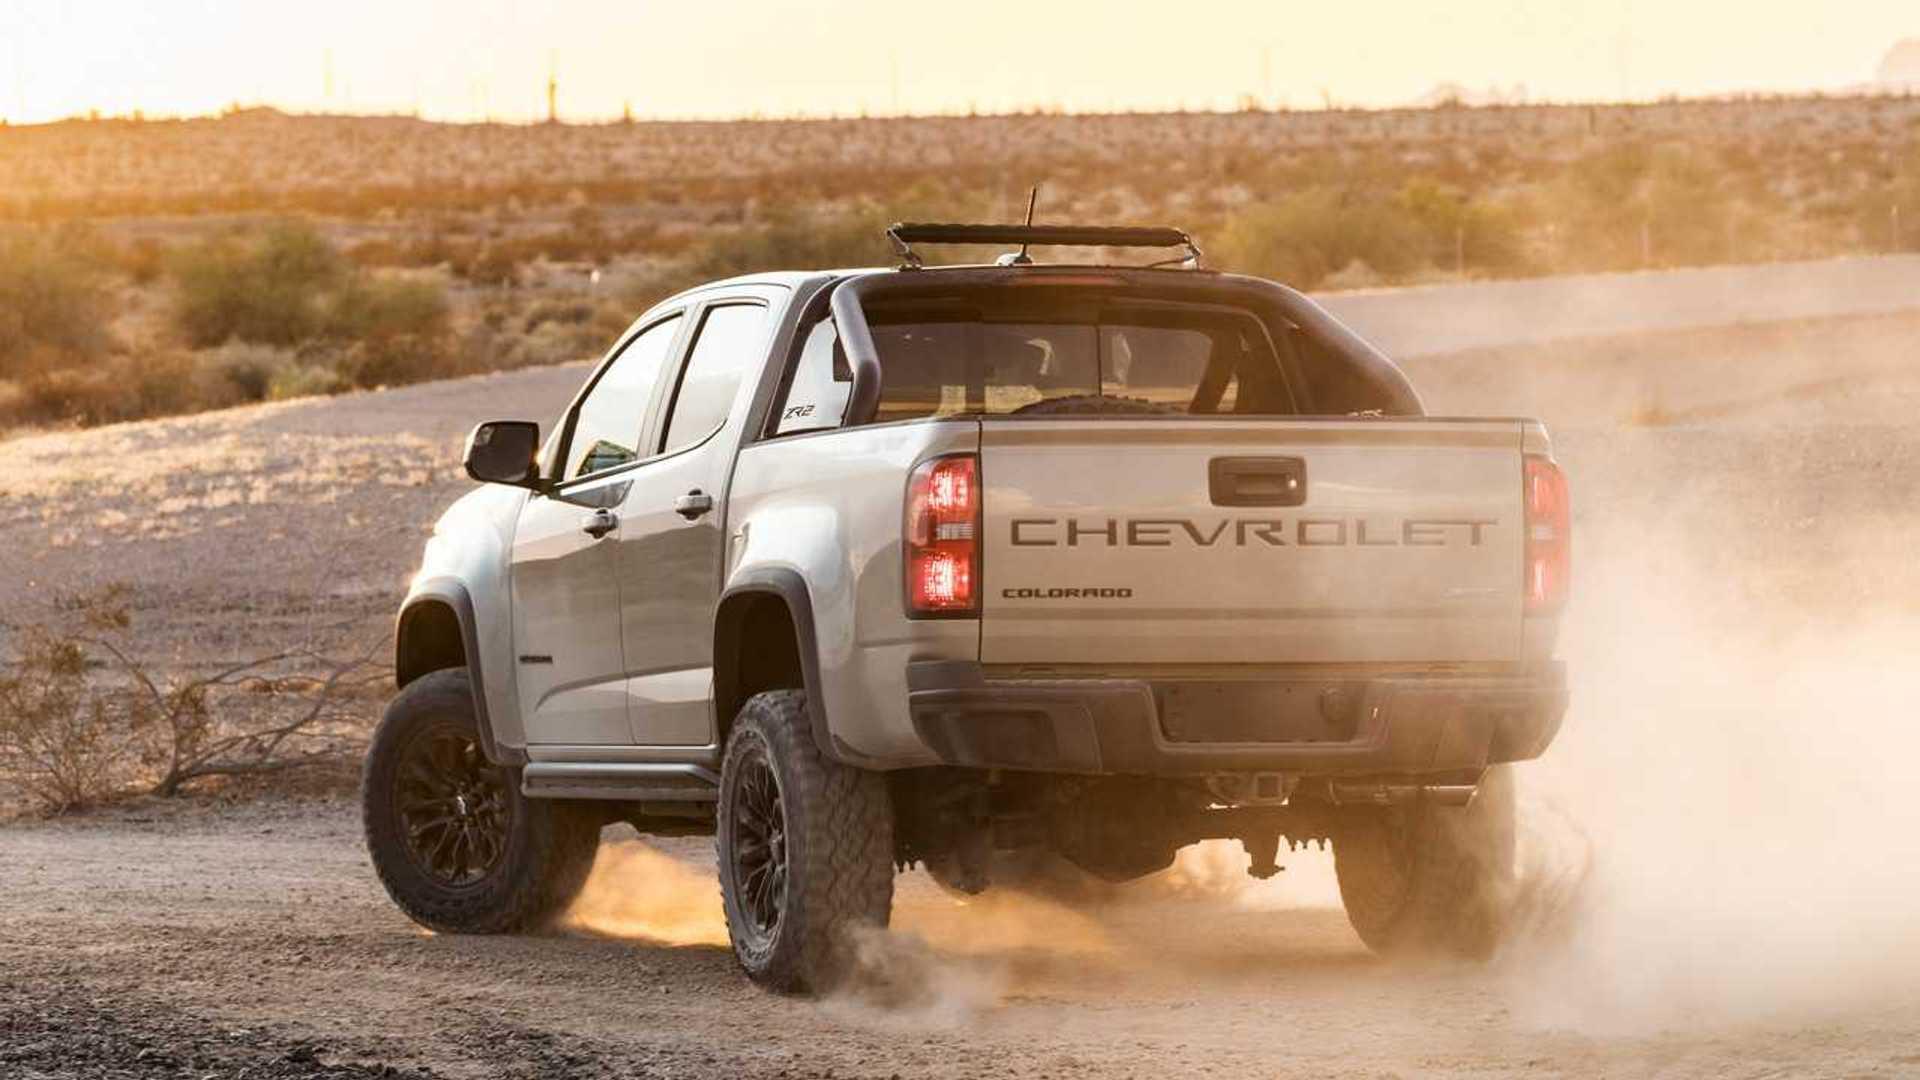 2021 chevrolet colorado debuts with more distinct looks